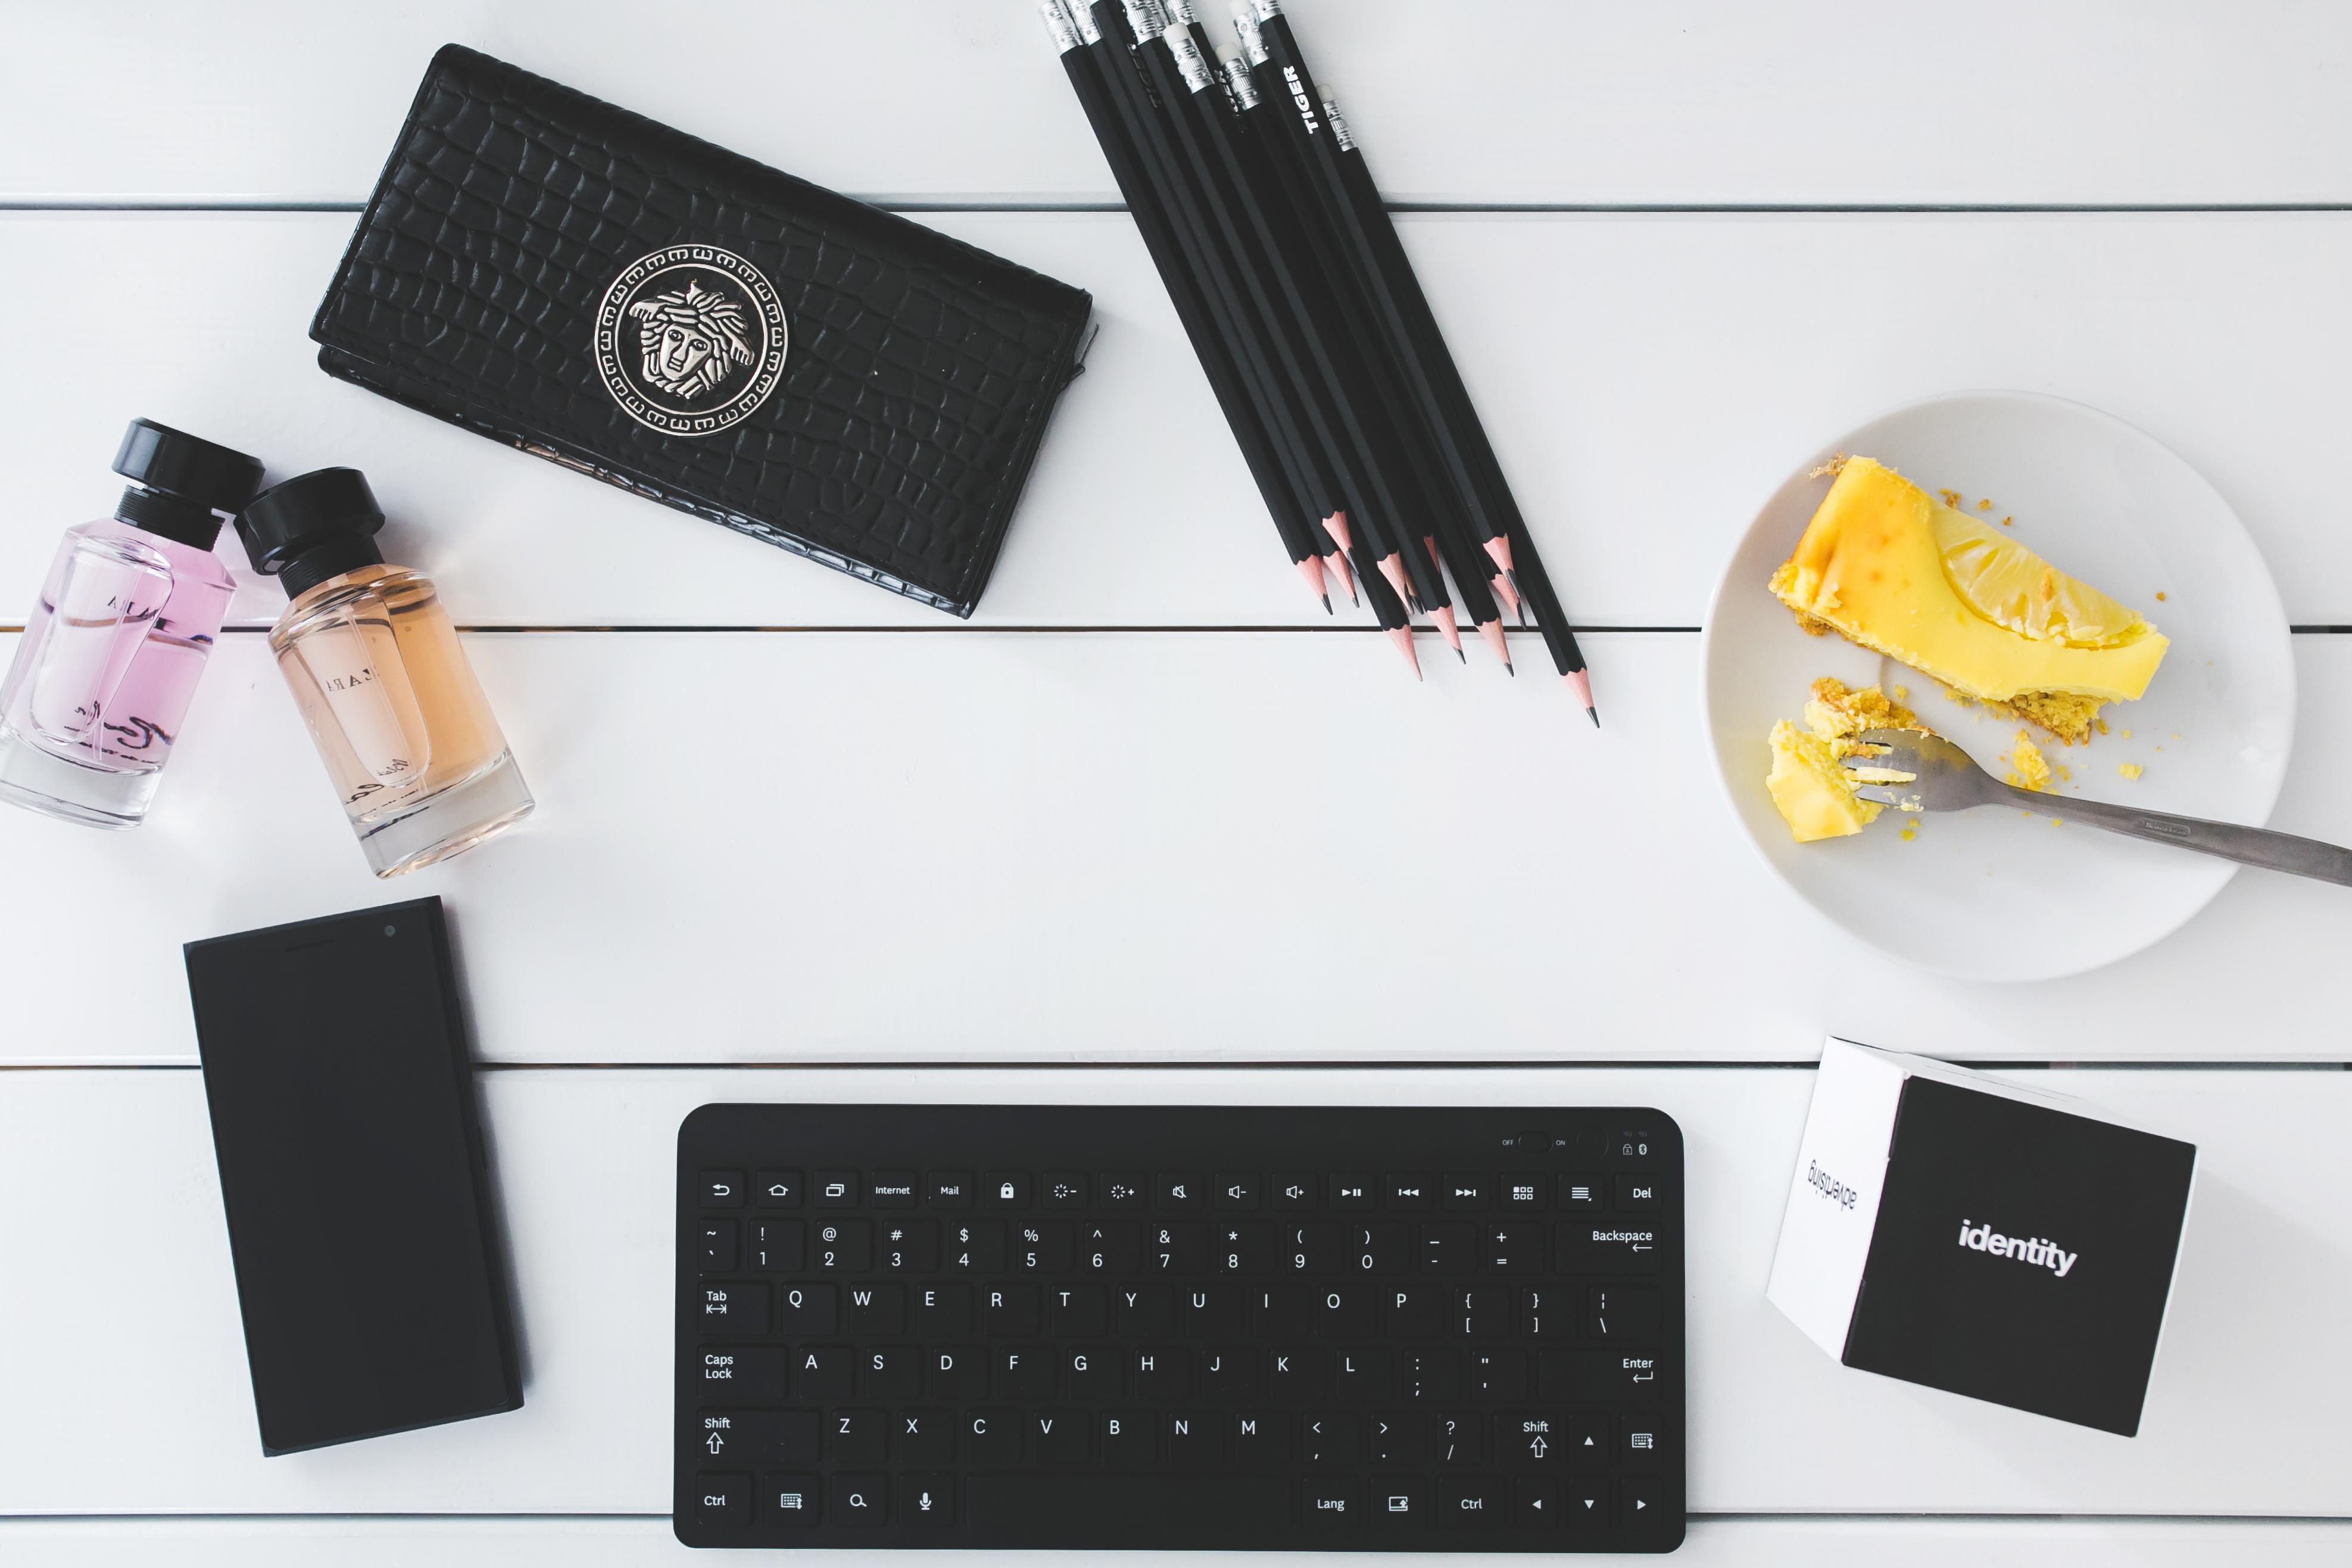 Desk Smartphone Keyboard Technology Worke Office Cake Brand Product Eye Pencils